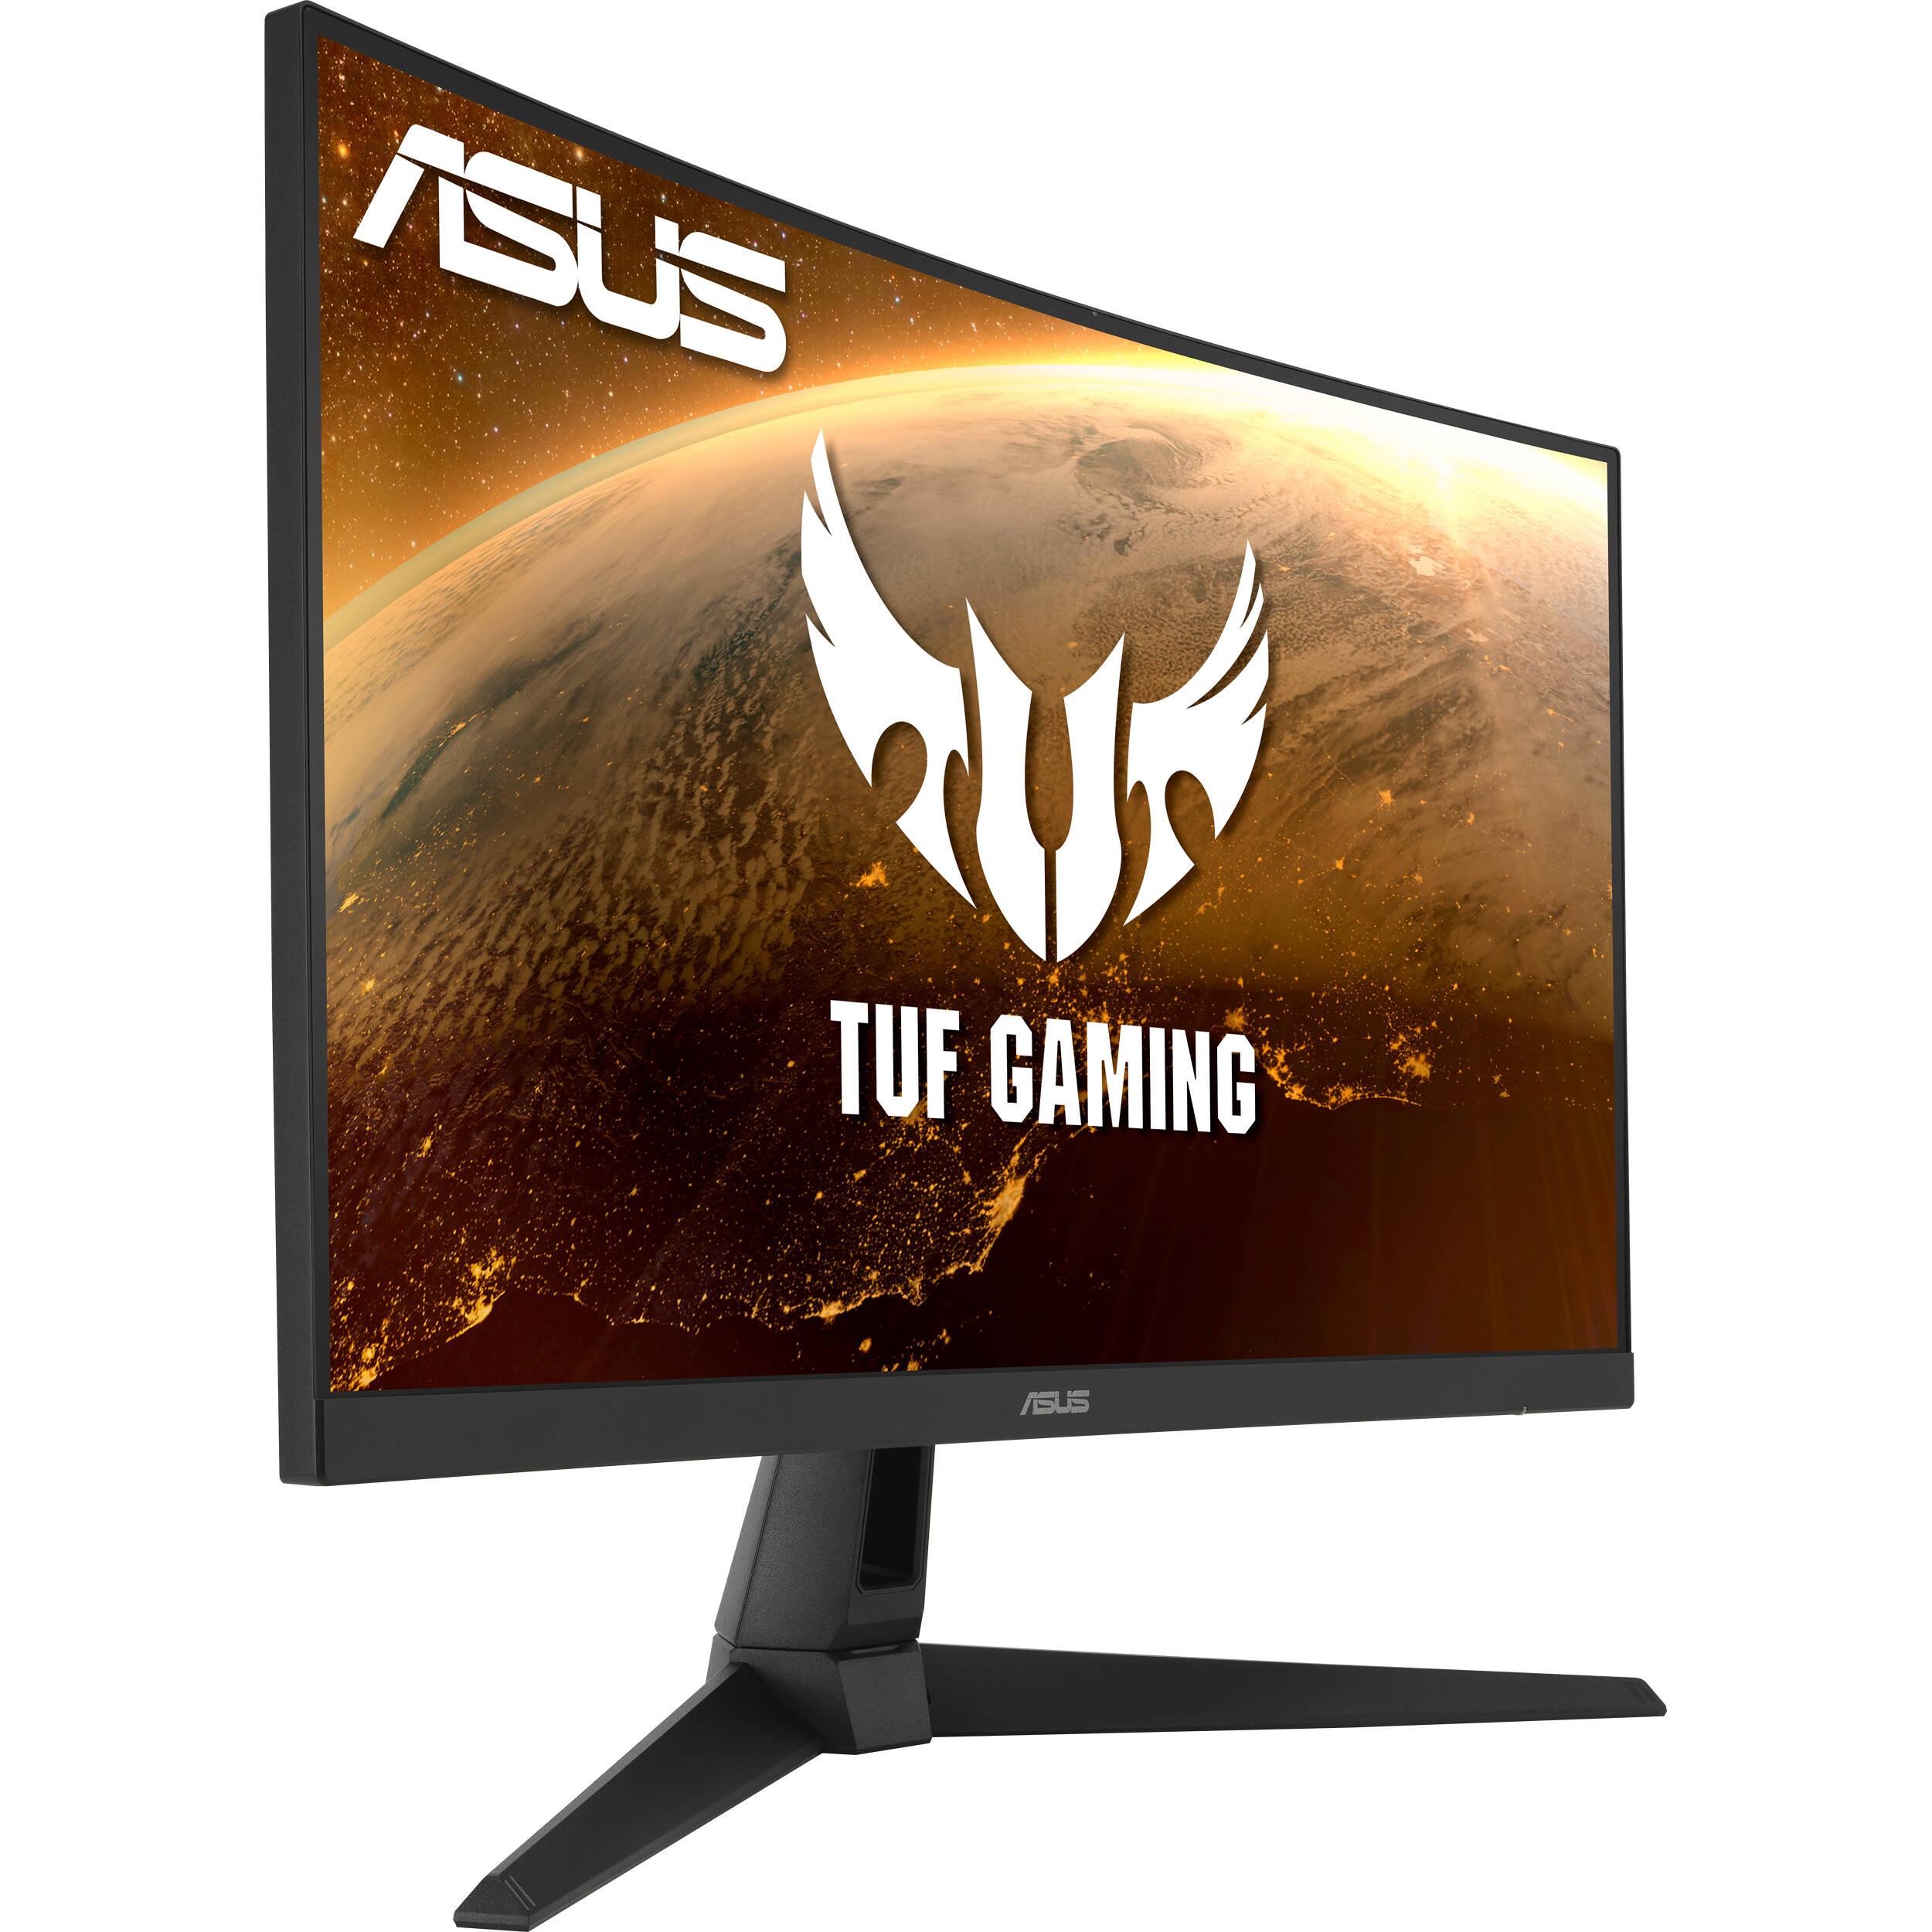 "ASUS TUF Gaming VG9WQ9B 9"" 96:9 Curved 965 Hz FreeSync QHD VA Gaming  Monitor"